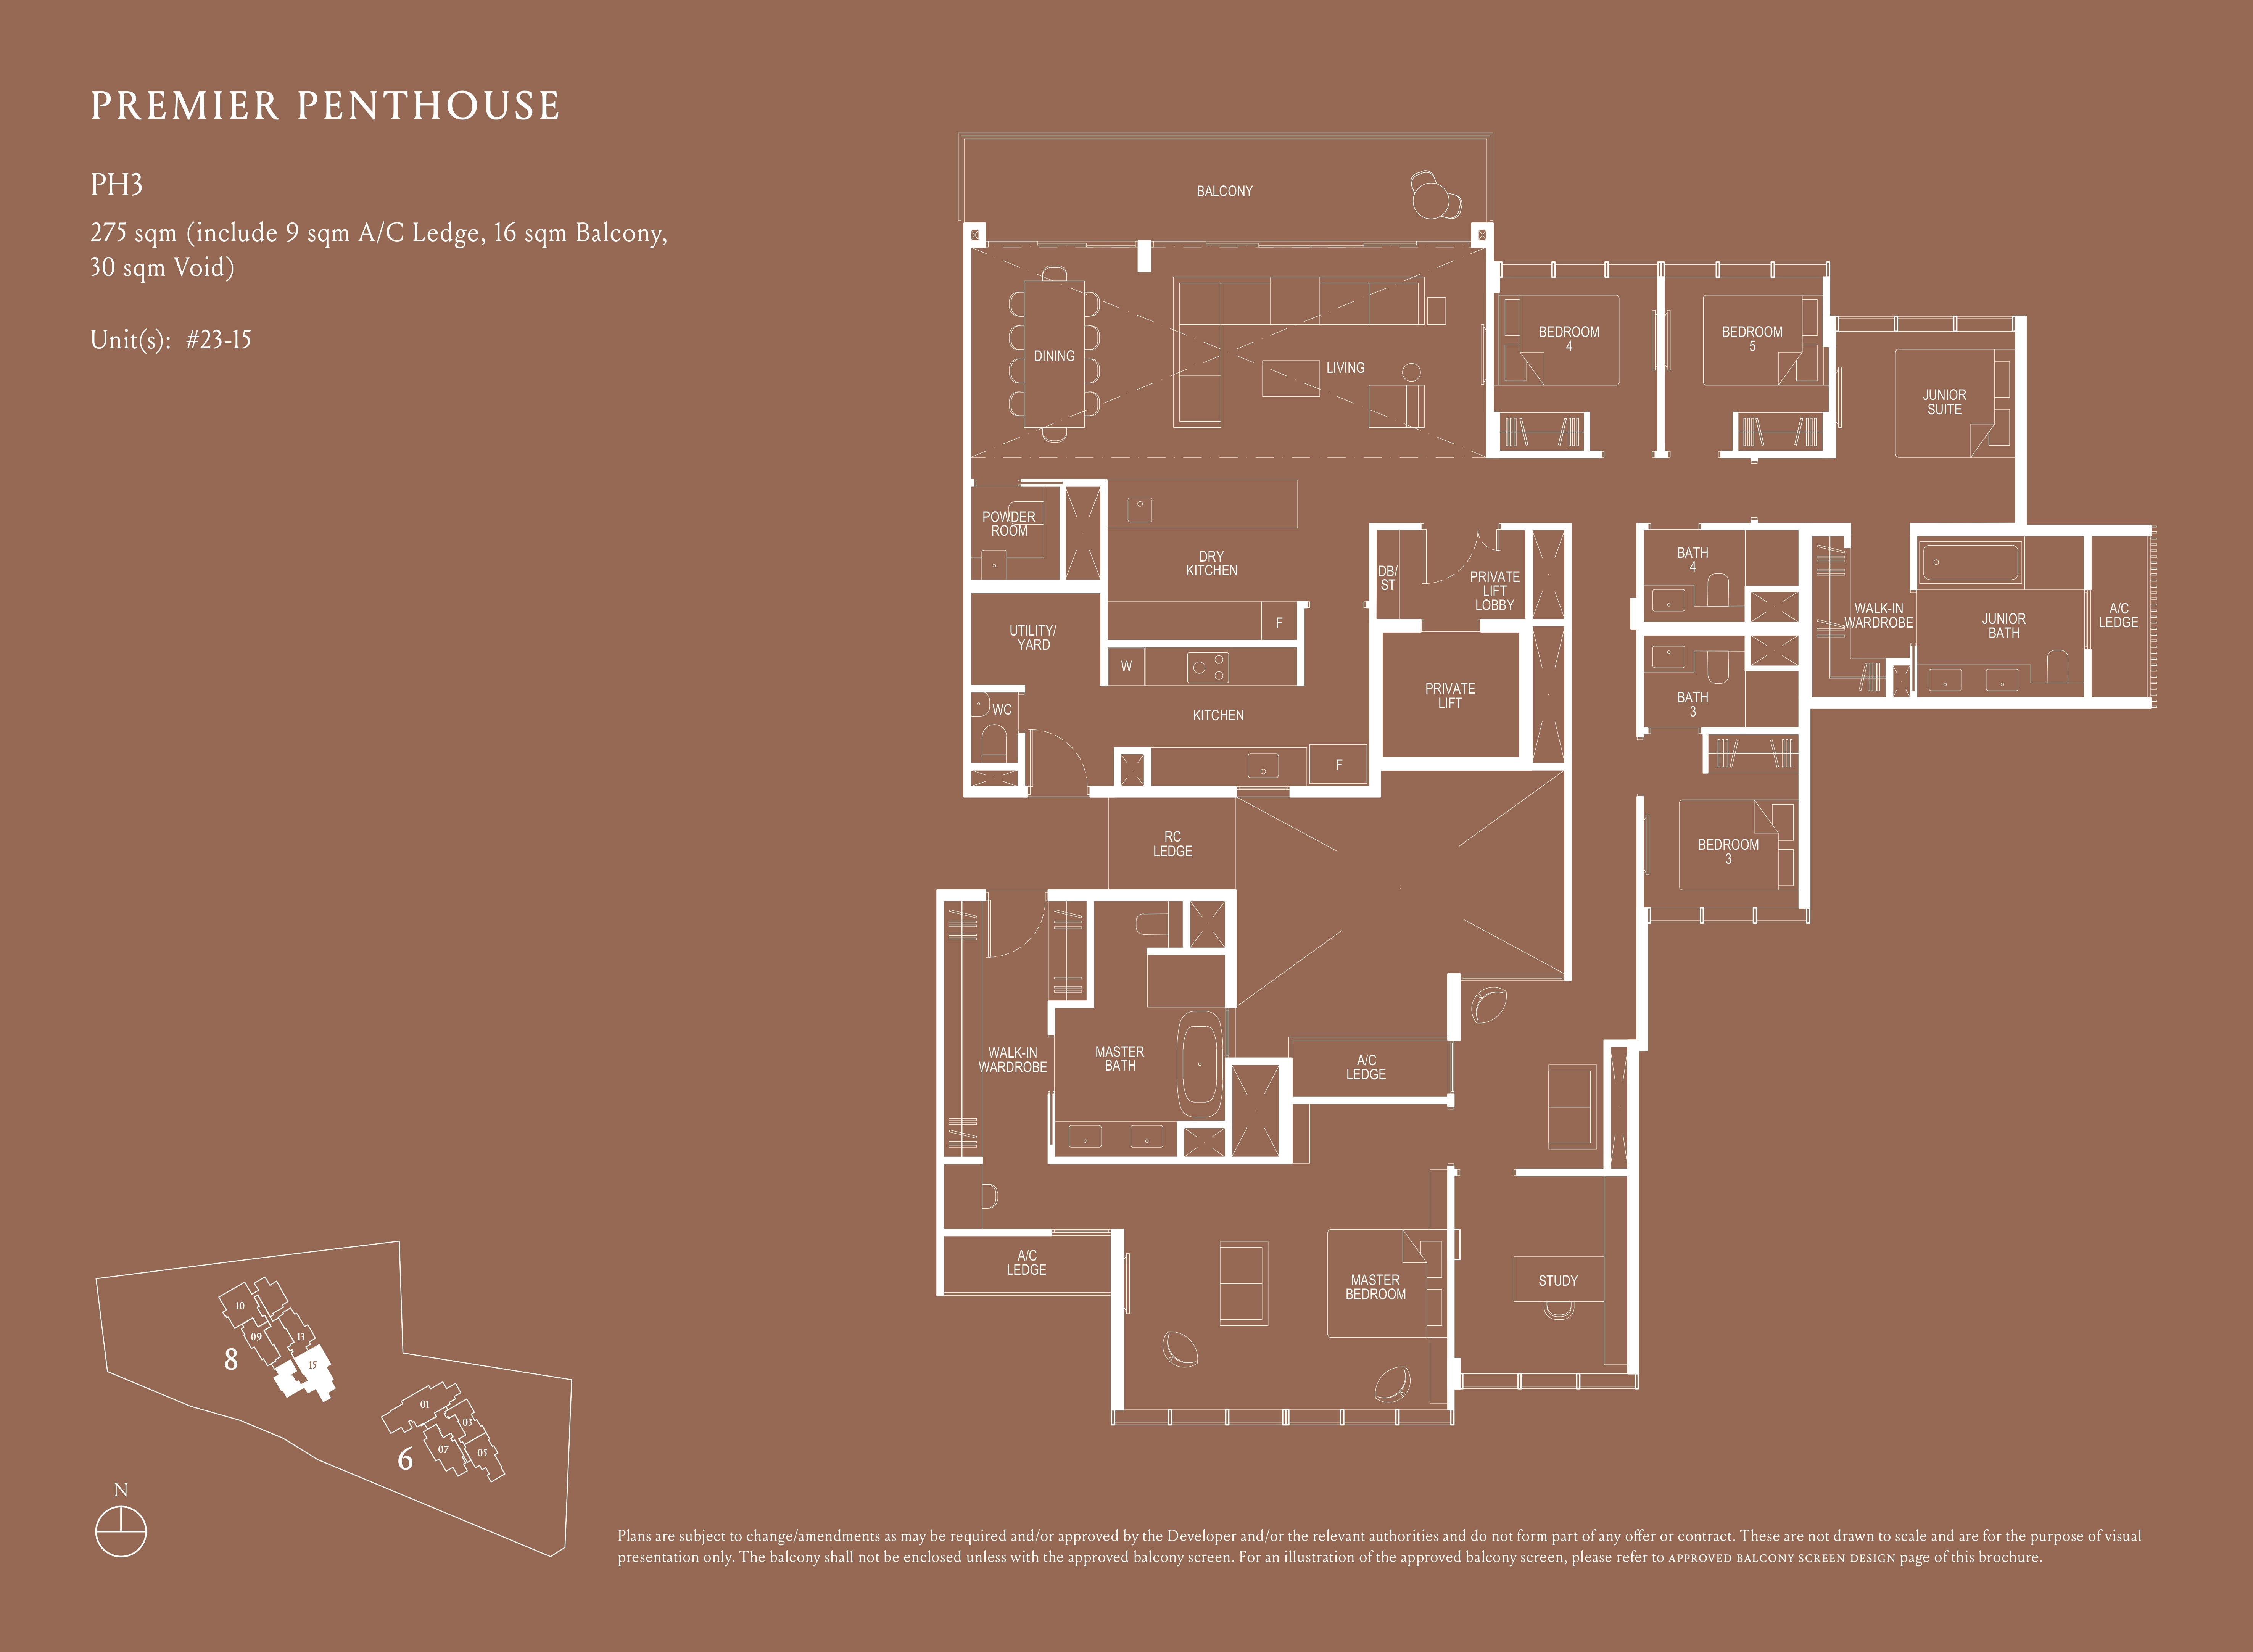 Kopar At Newton 纽顿铜源 premier penthouse 275 sqm PH3 floor plan